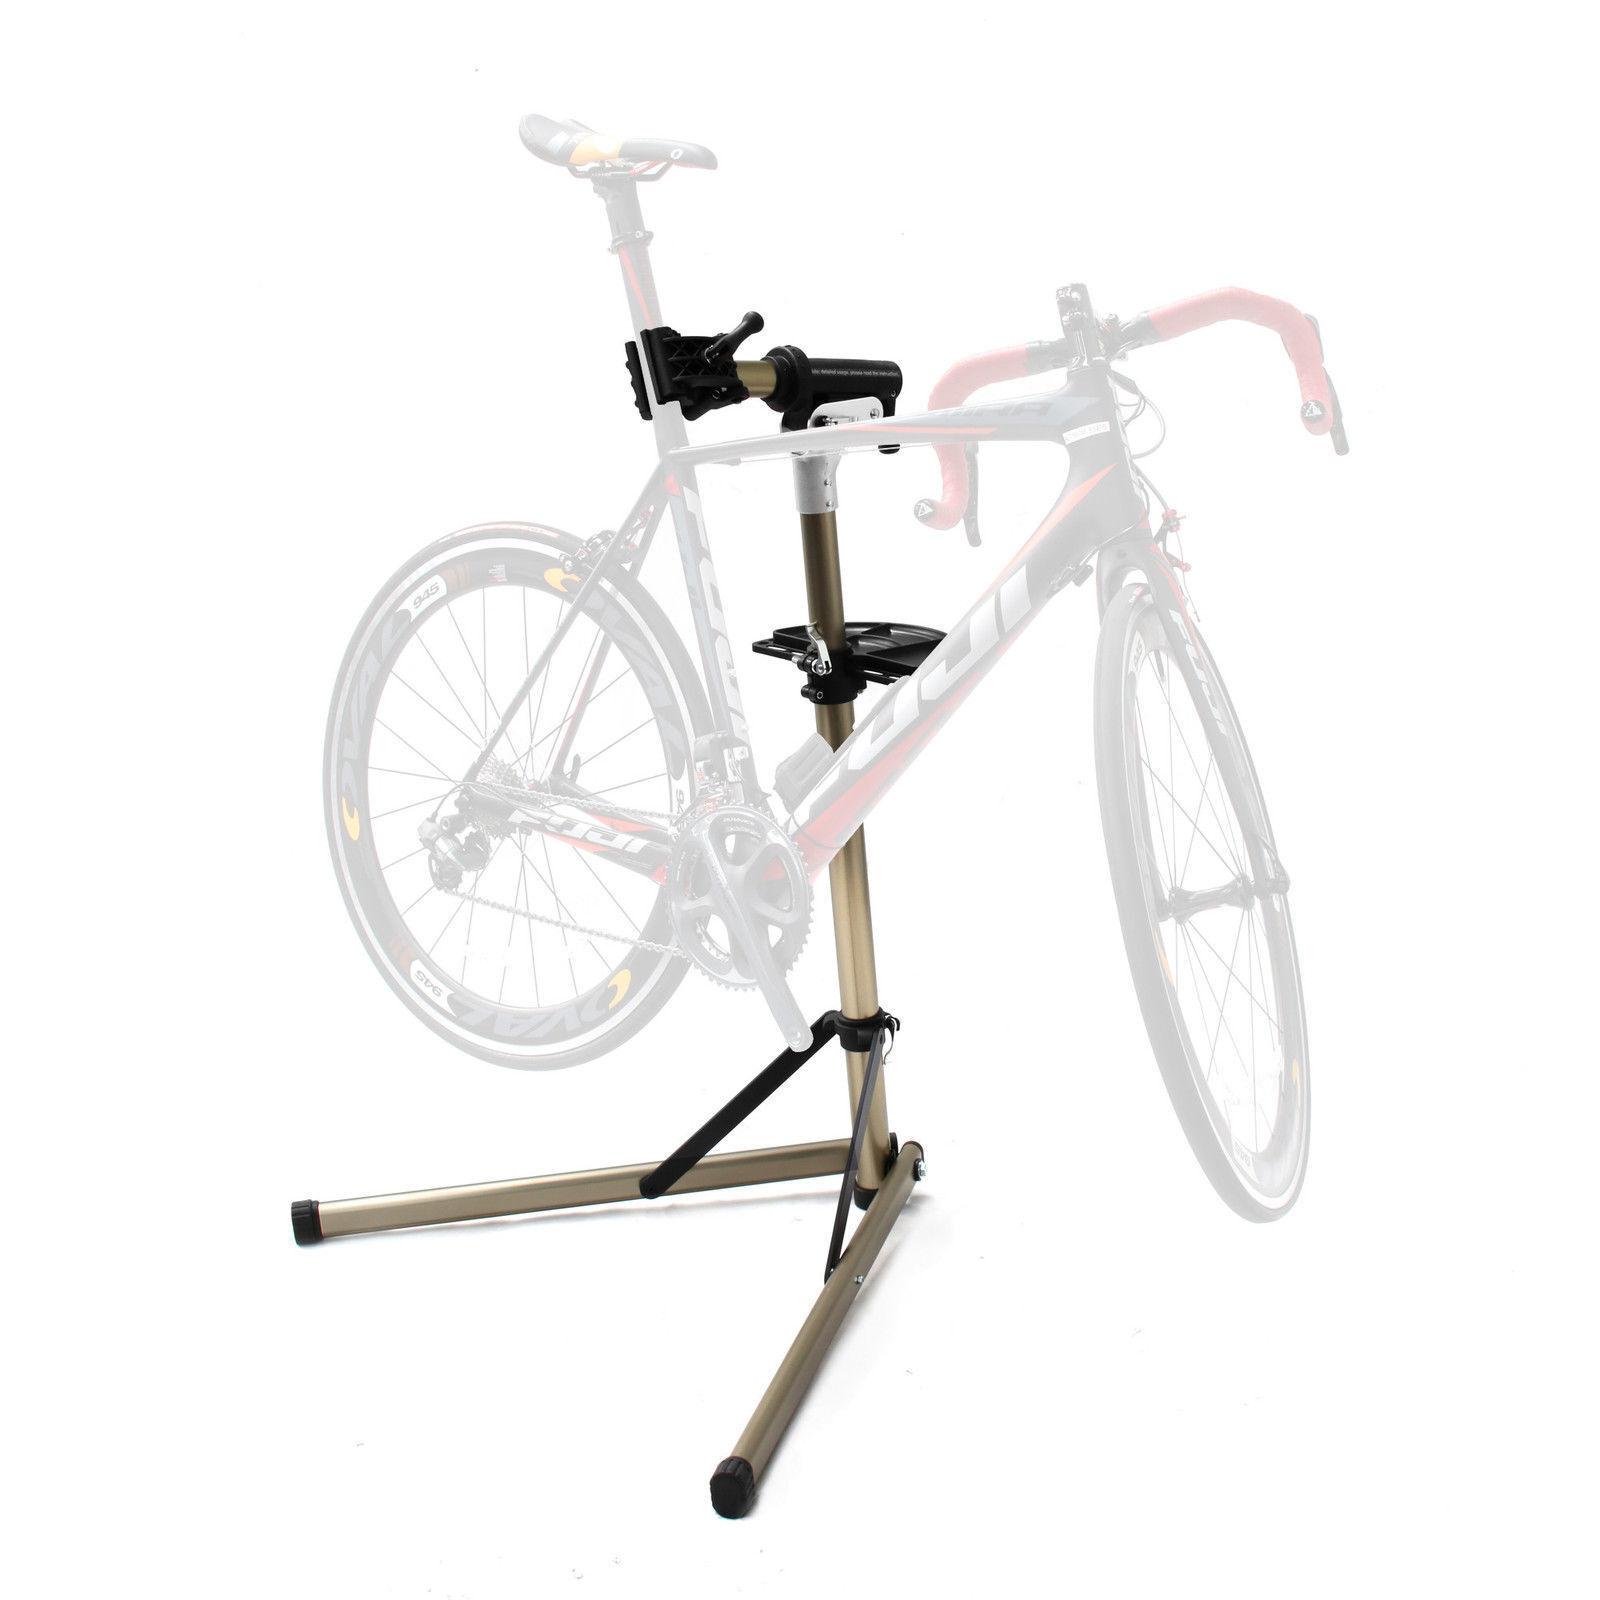 of bicycling bikebikeracks bike gettingaroundredmond racks city transportation aluminum rack redmond userfile